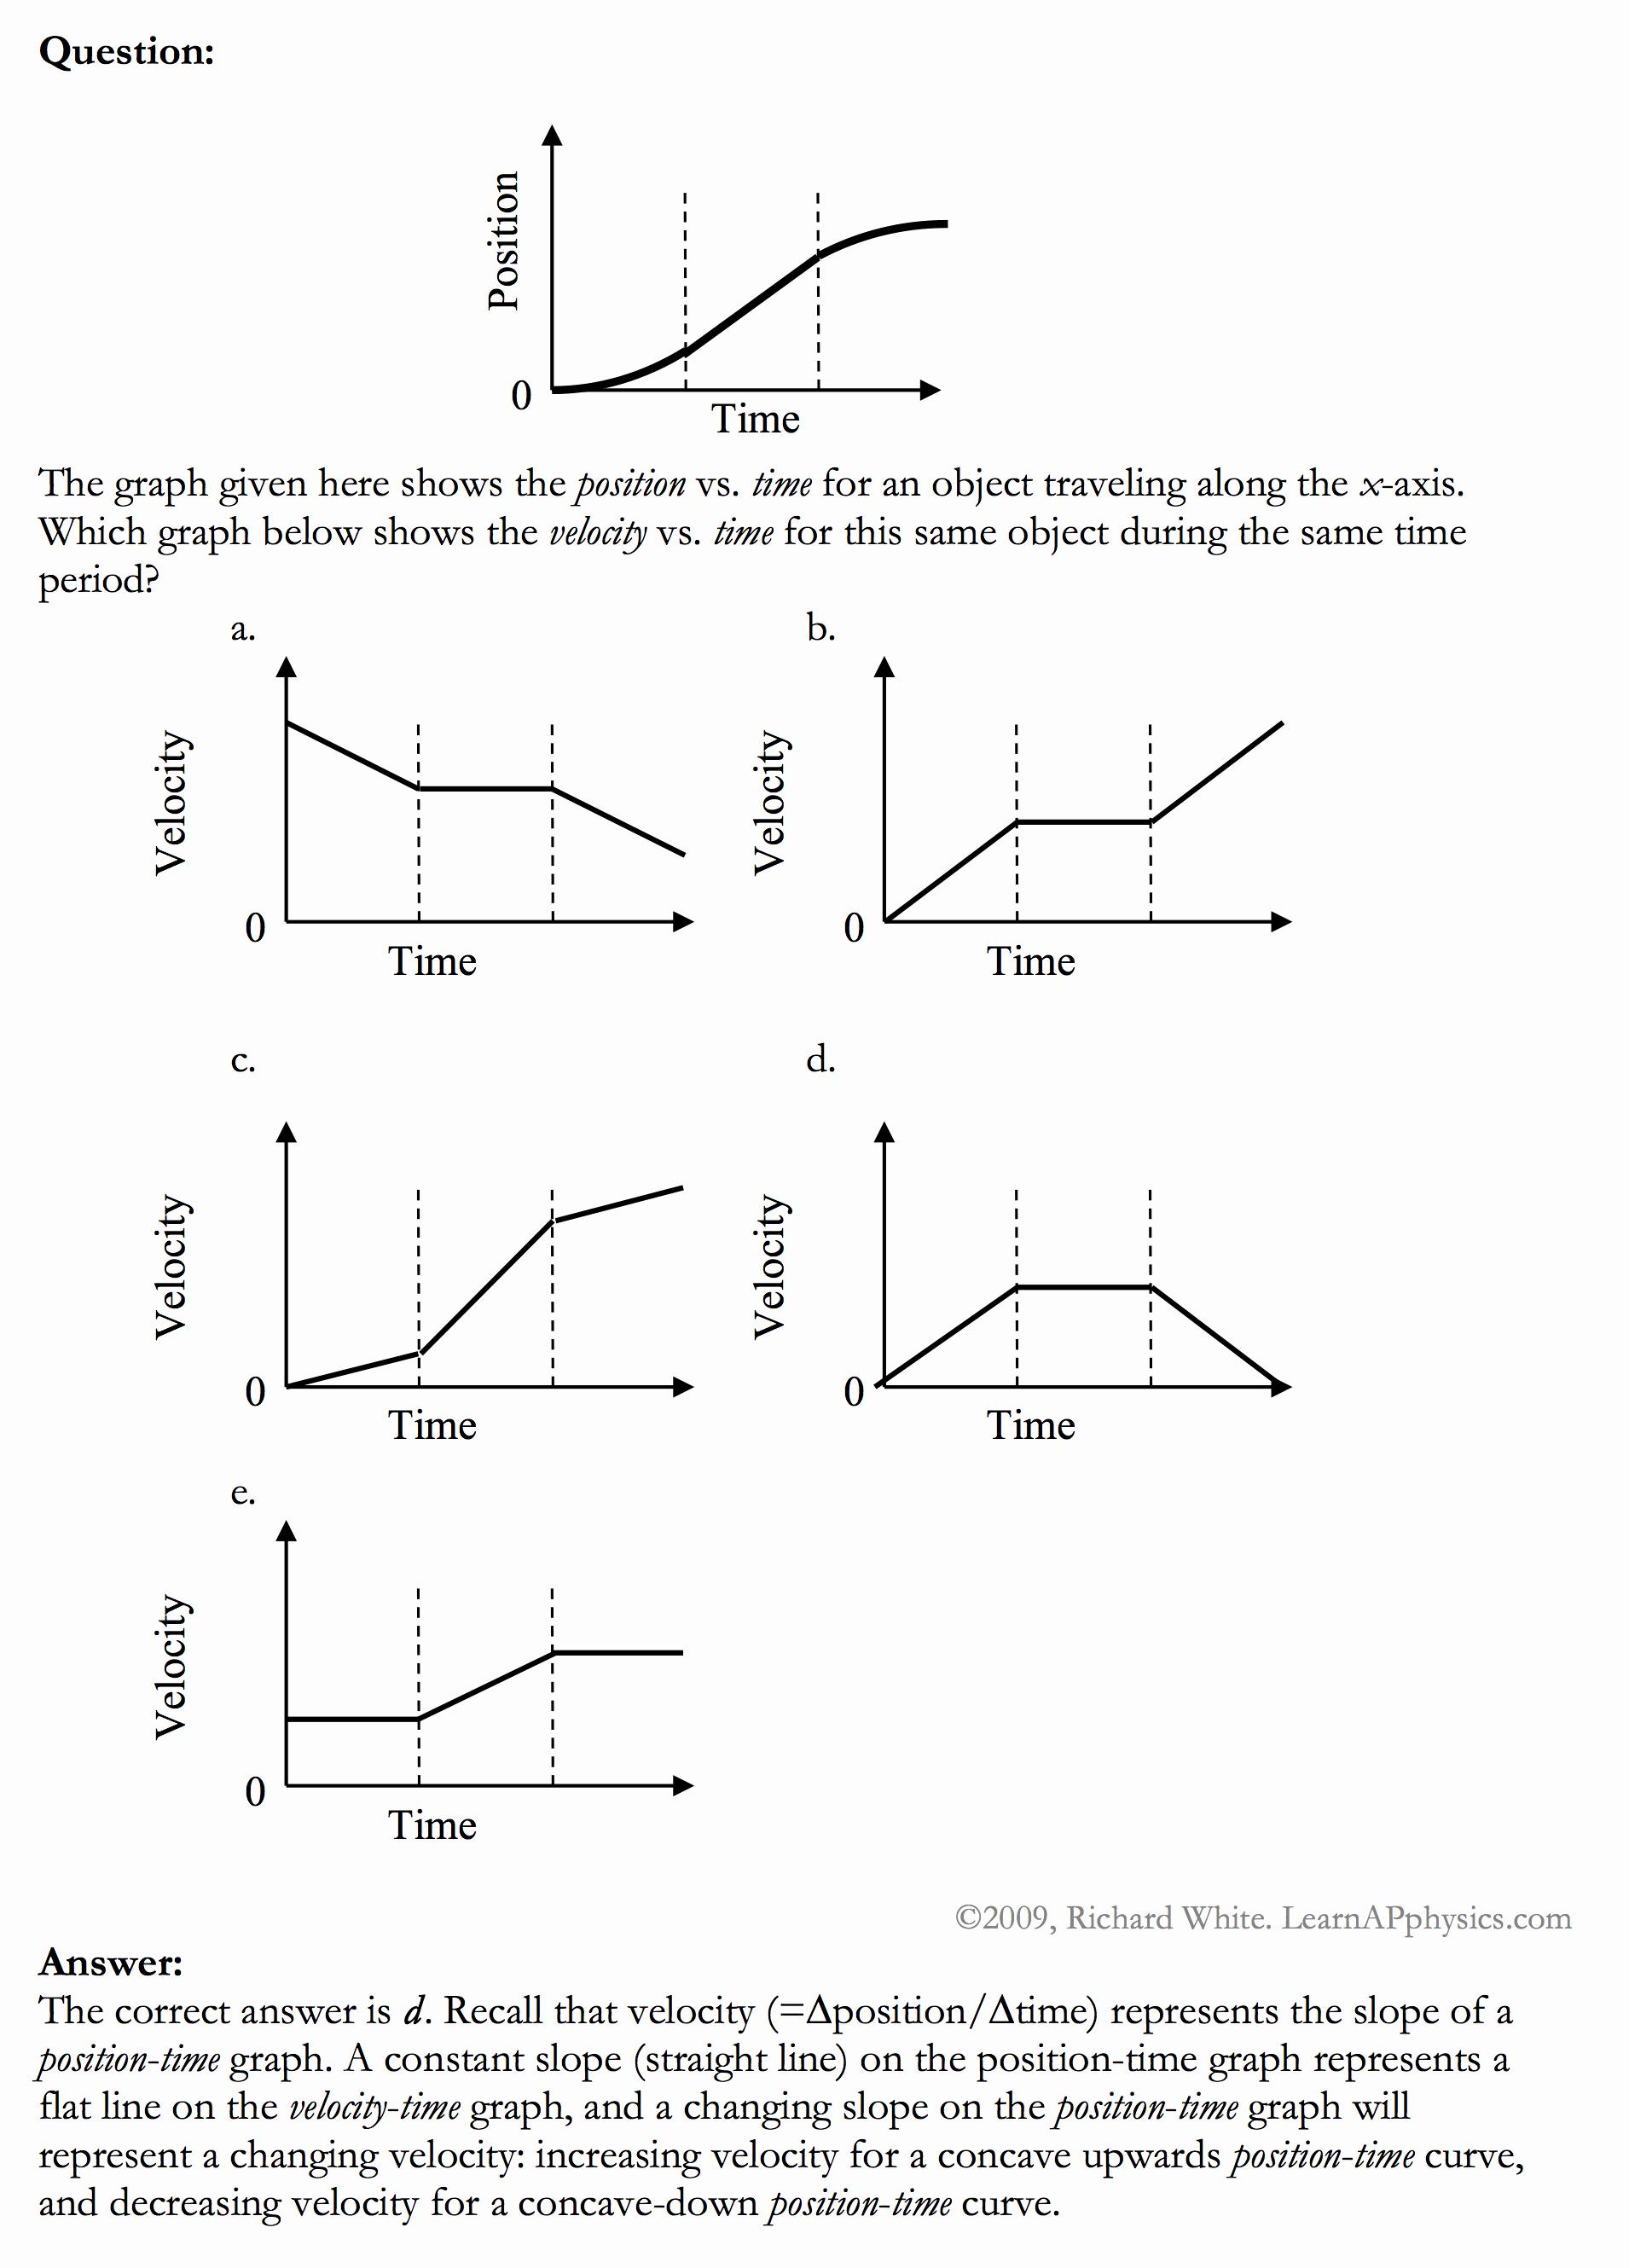 Kinematics Practice Problems Worksheet Luxury Learn Ap Physics Ap Physics 1 & 2 Kinematics